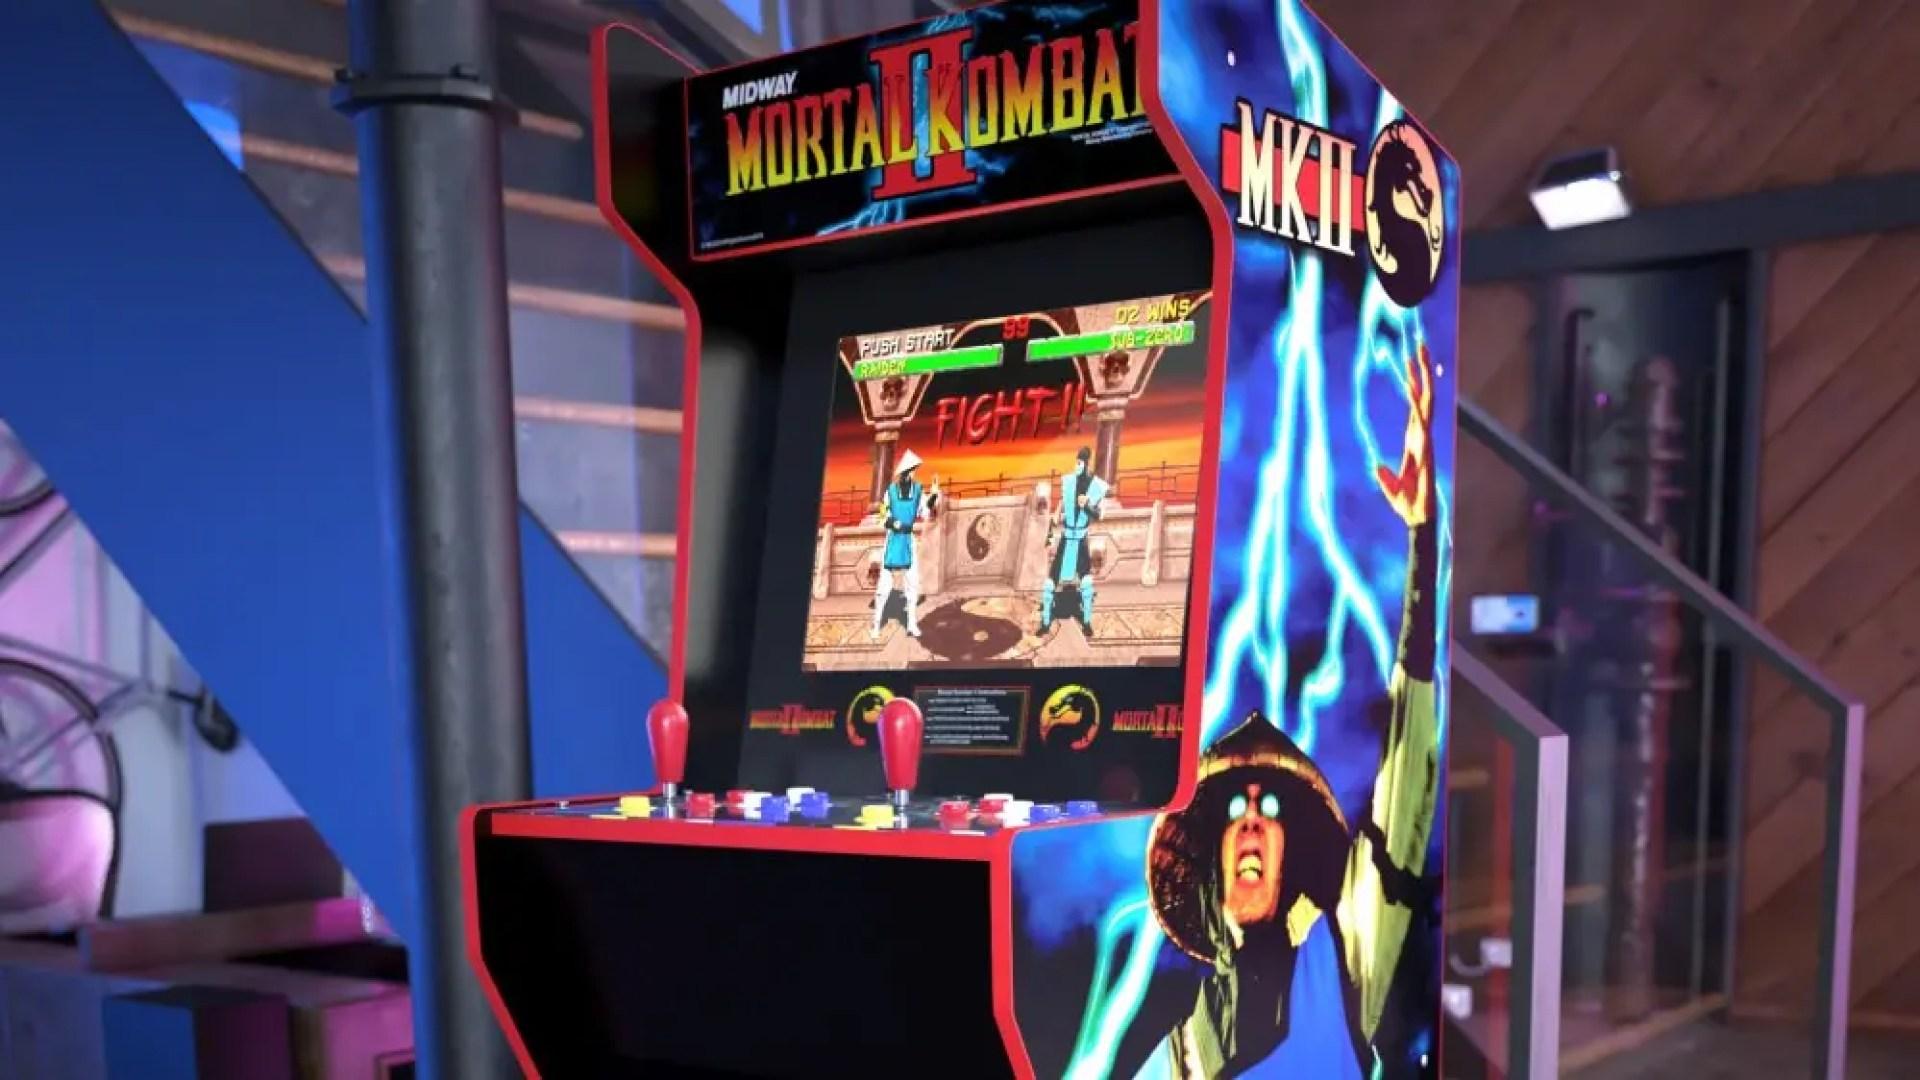 A closeup of a Mortal Kombat arcade machine